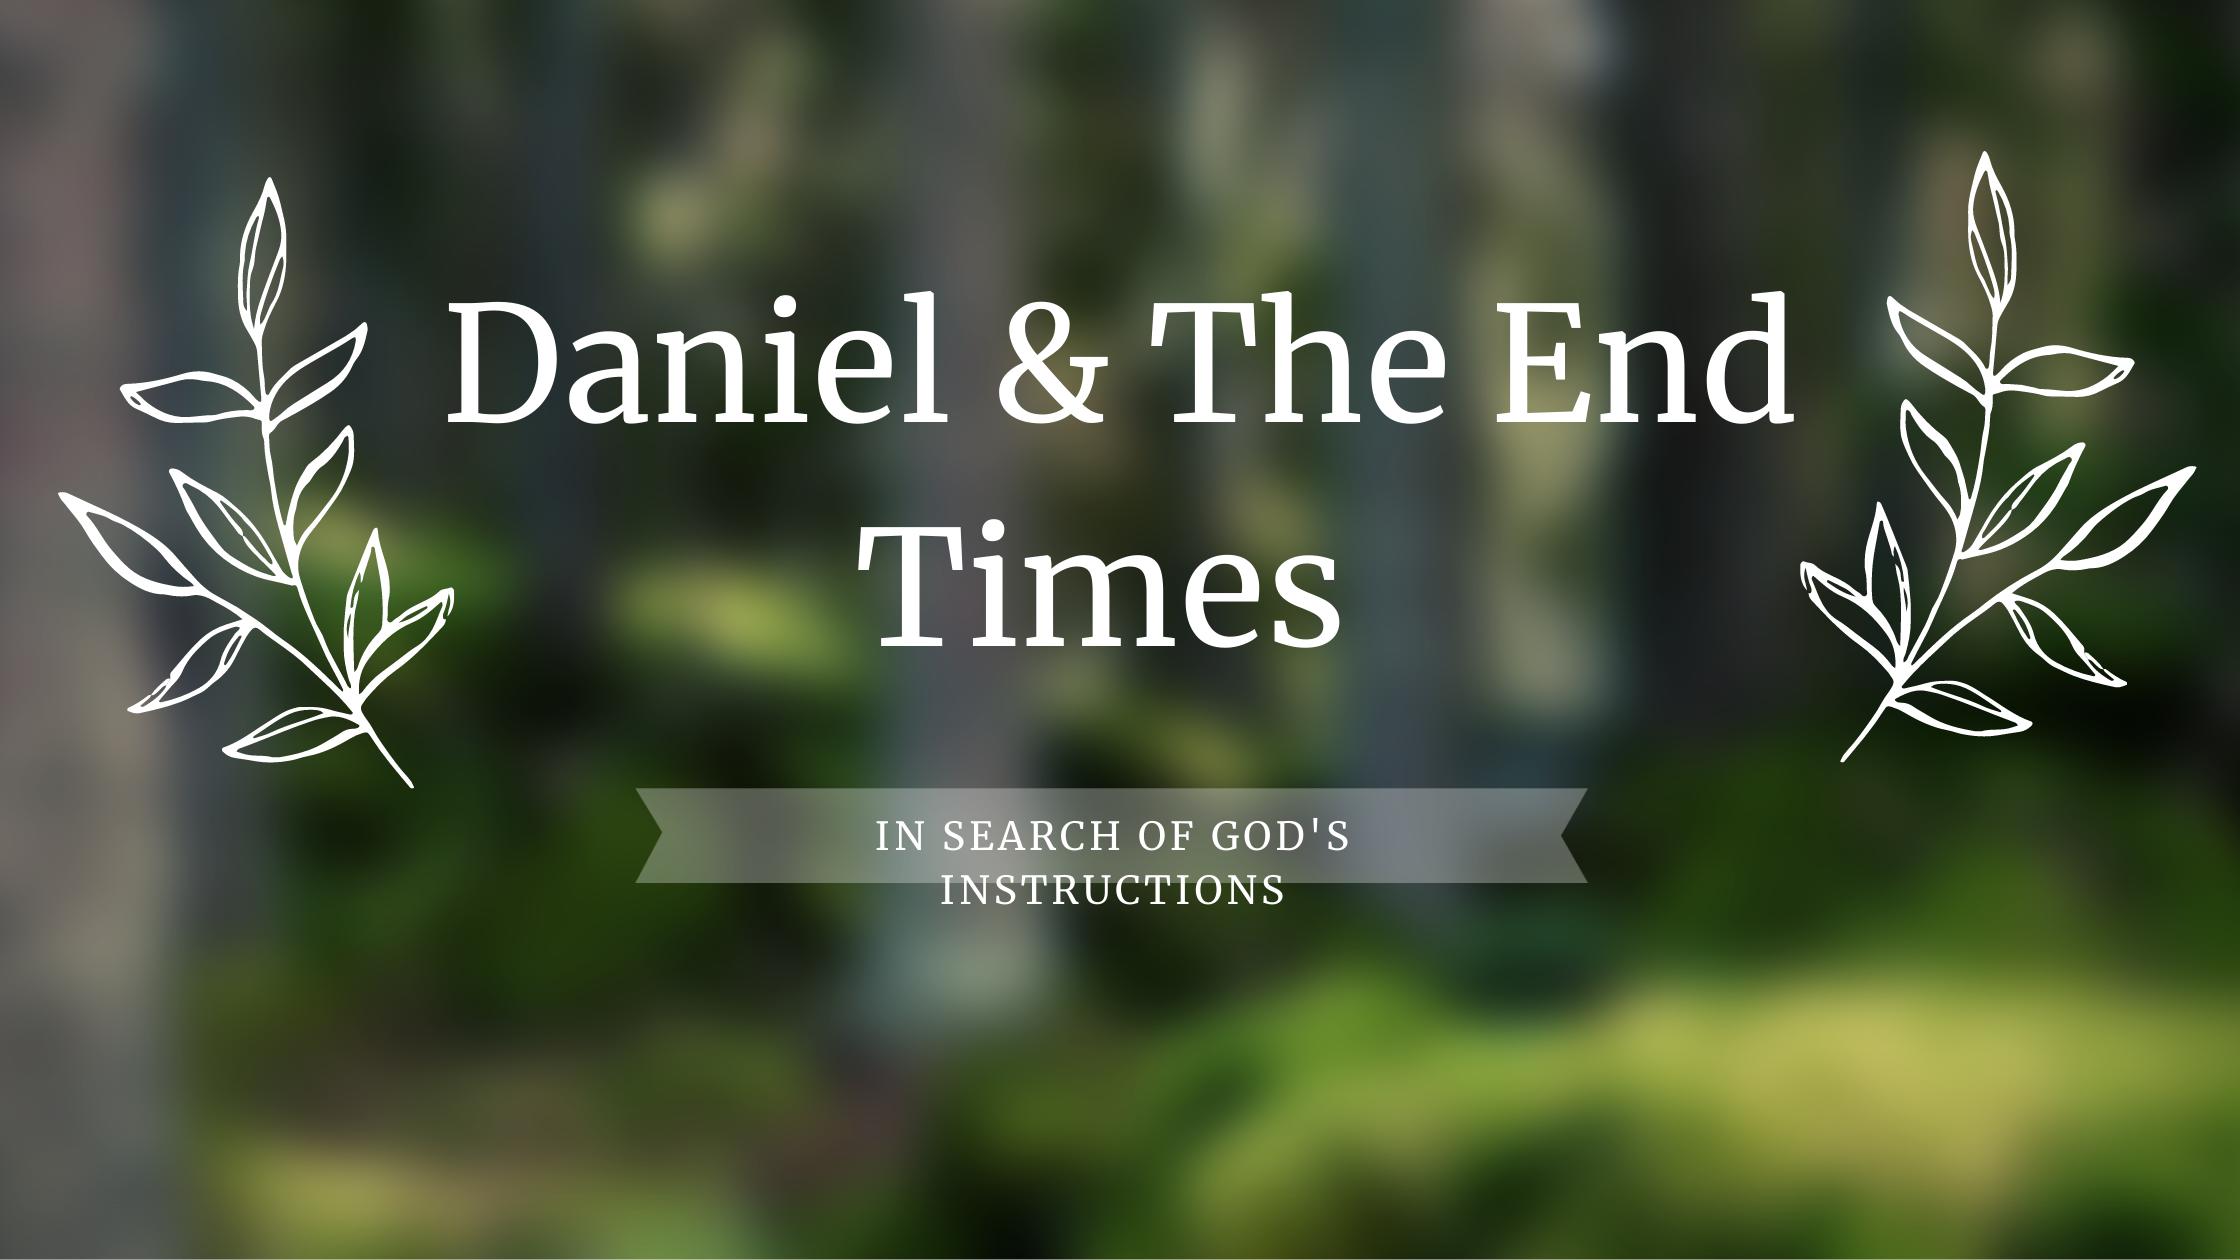 Daniel & The End Times